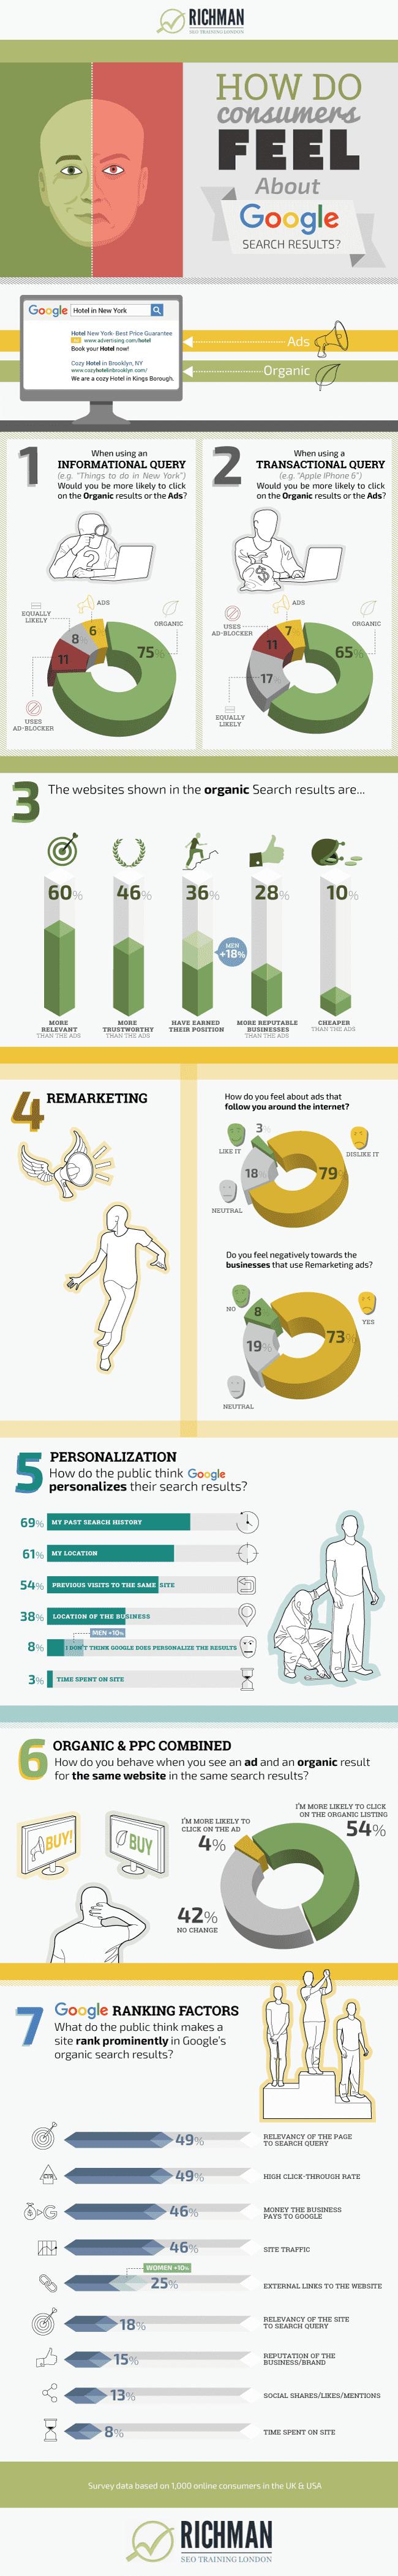 Google Consumer Attitudes Survey